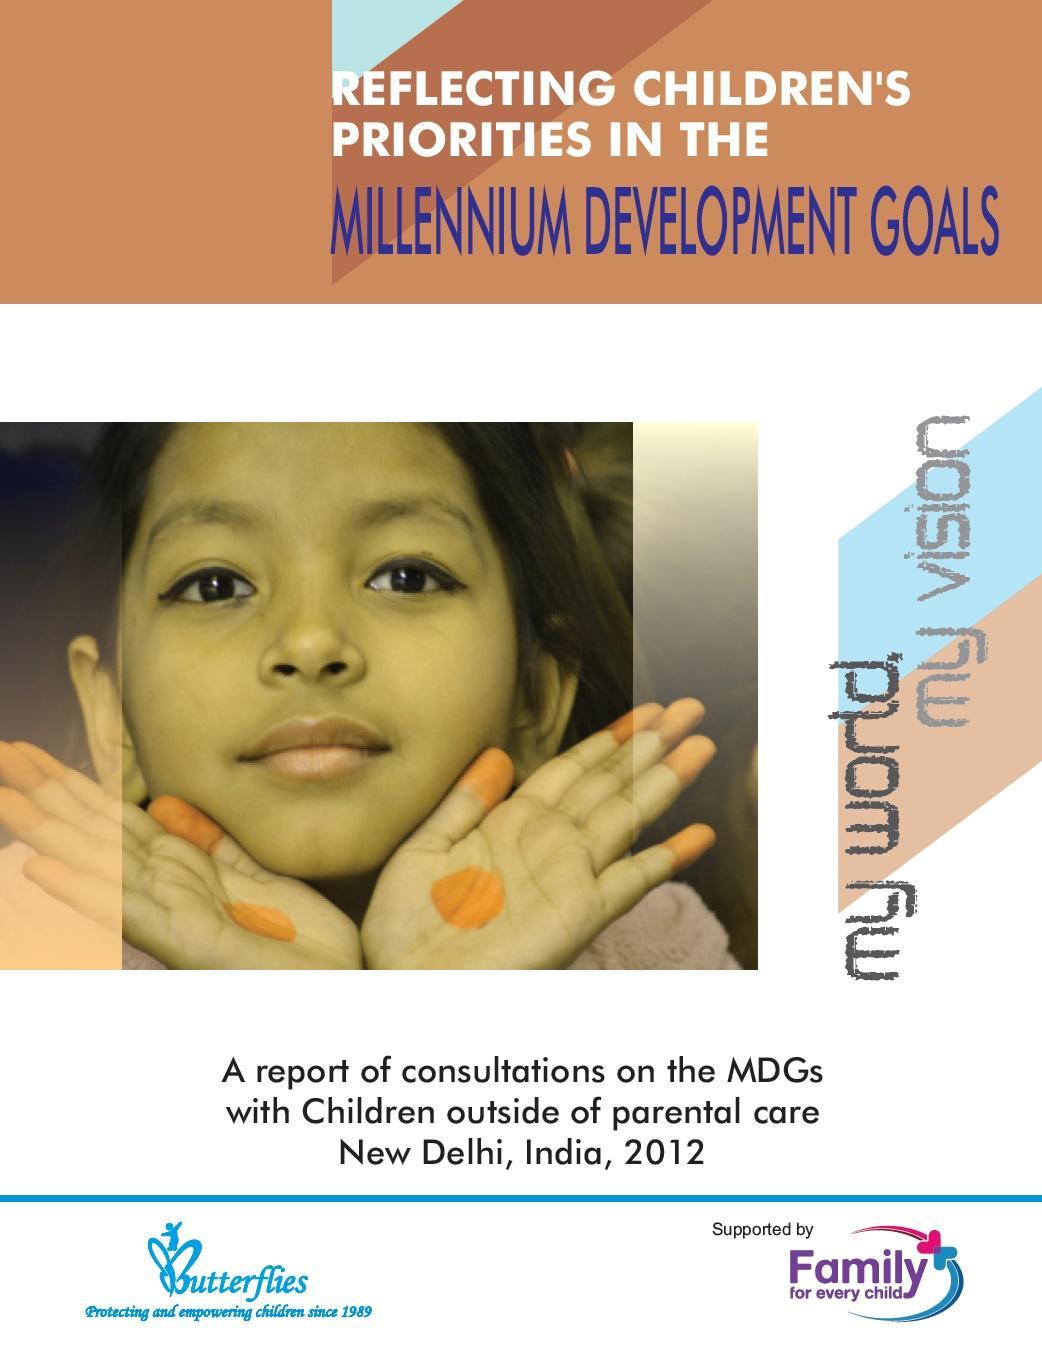 Reflecting Childrens Priorities in the Millennium Development Goals